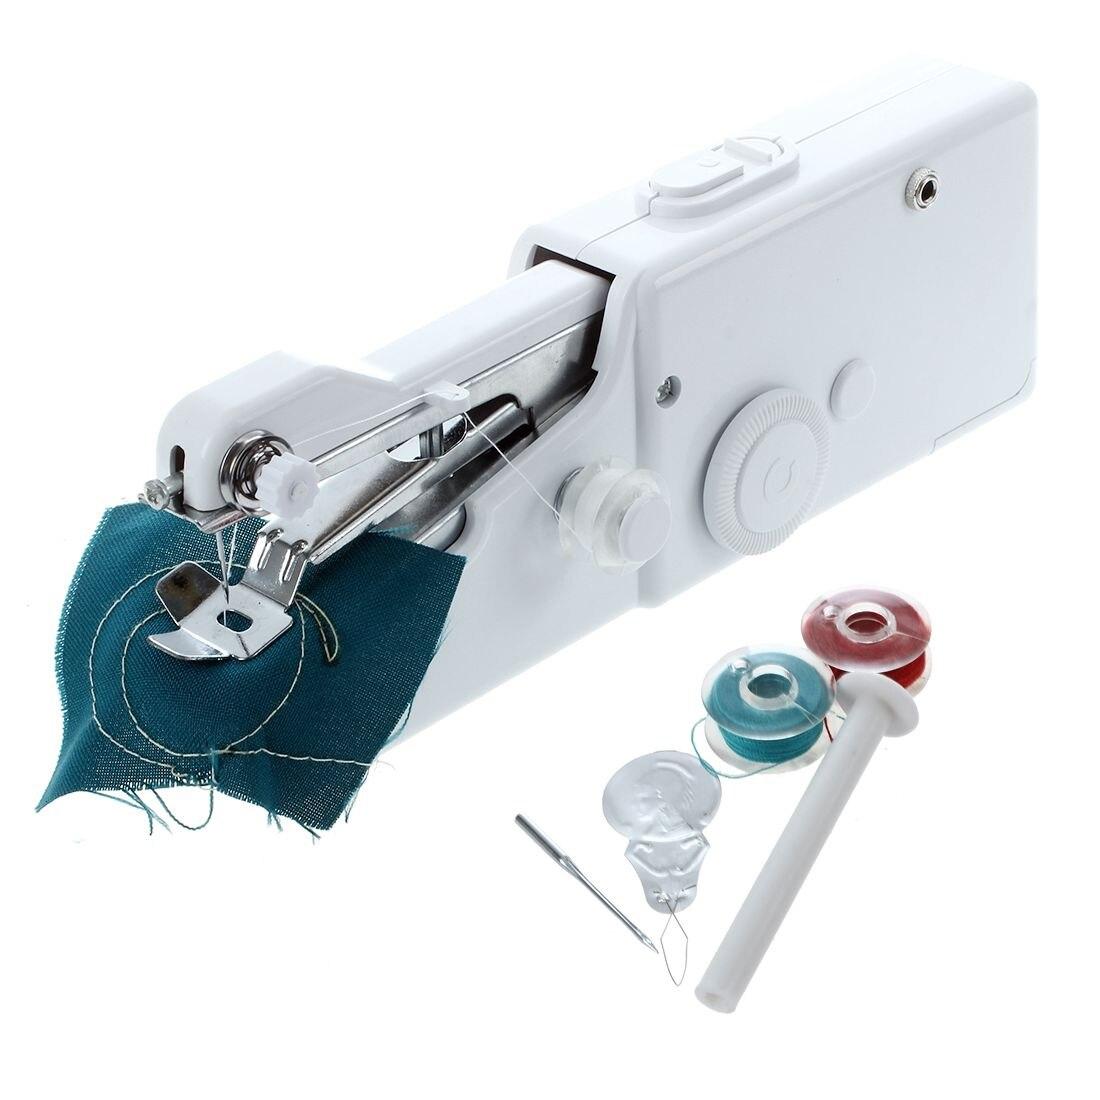 2017 Mini Portable Handheld sewing machines Stitch Sew needlework Cordless Clothes Fabrics Electric Sewing Machine Stitch Set maquina de coser de mano